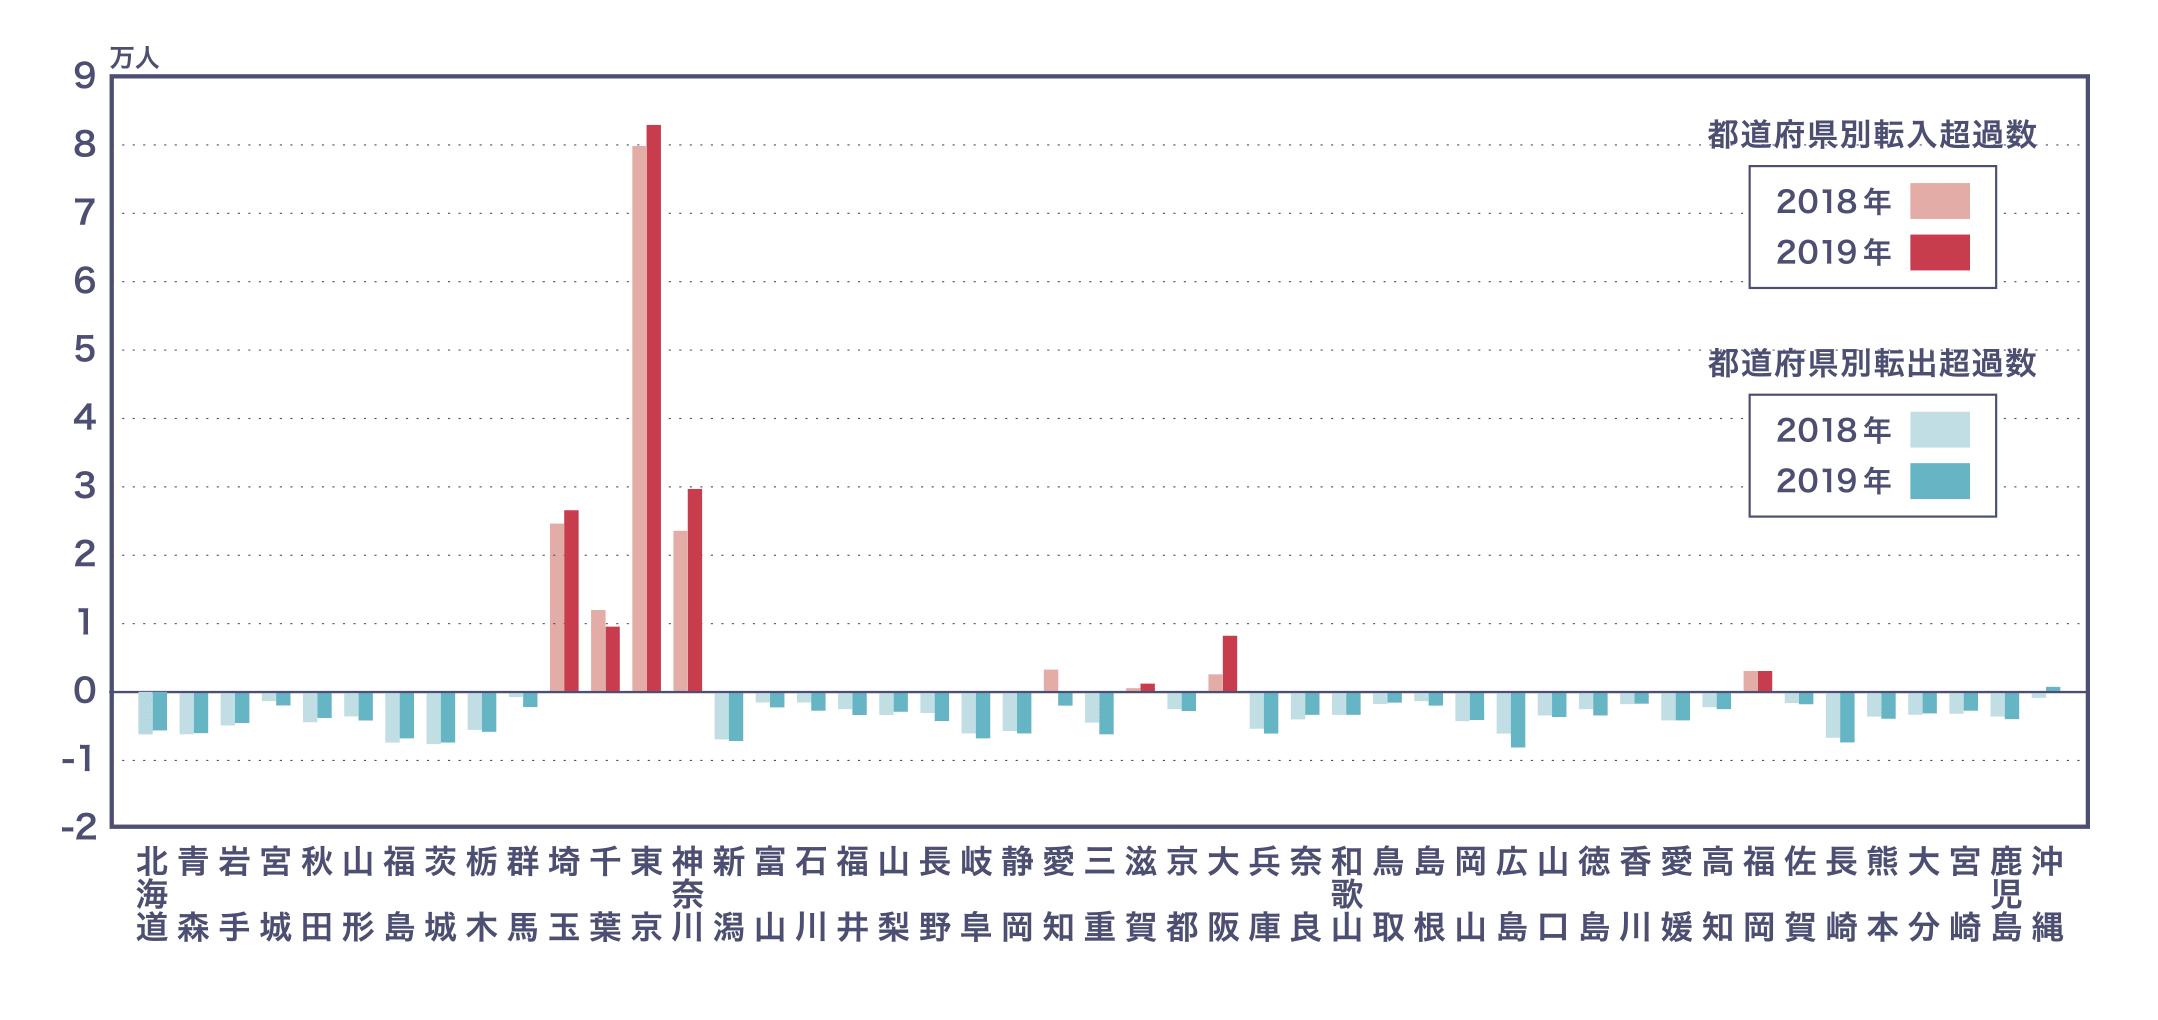 都道府県別転入超過数と転出超過数のグラフ